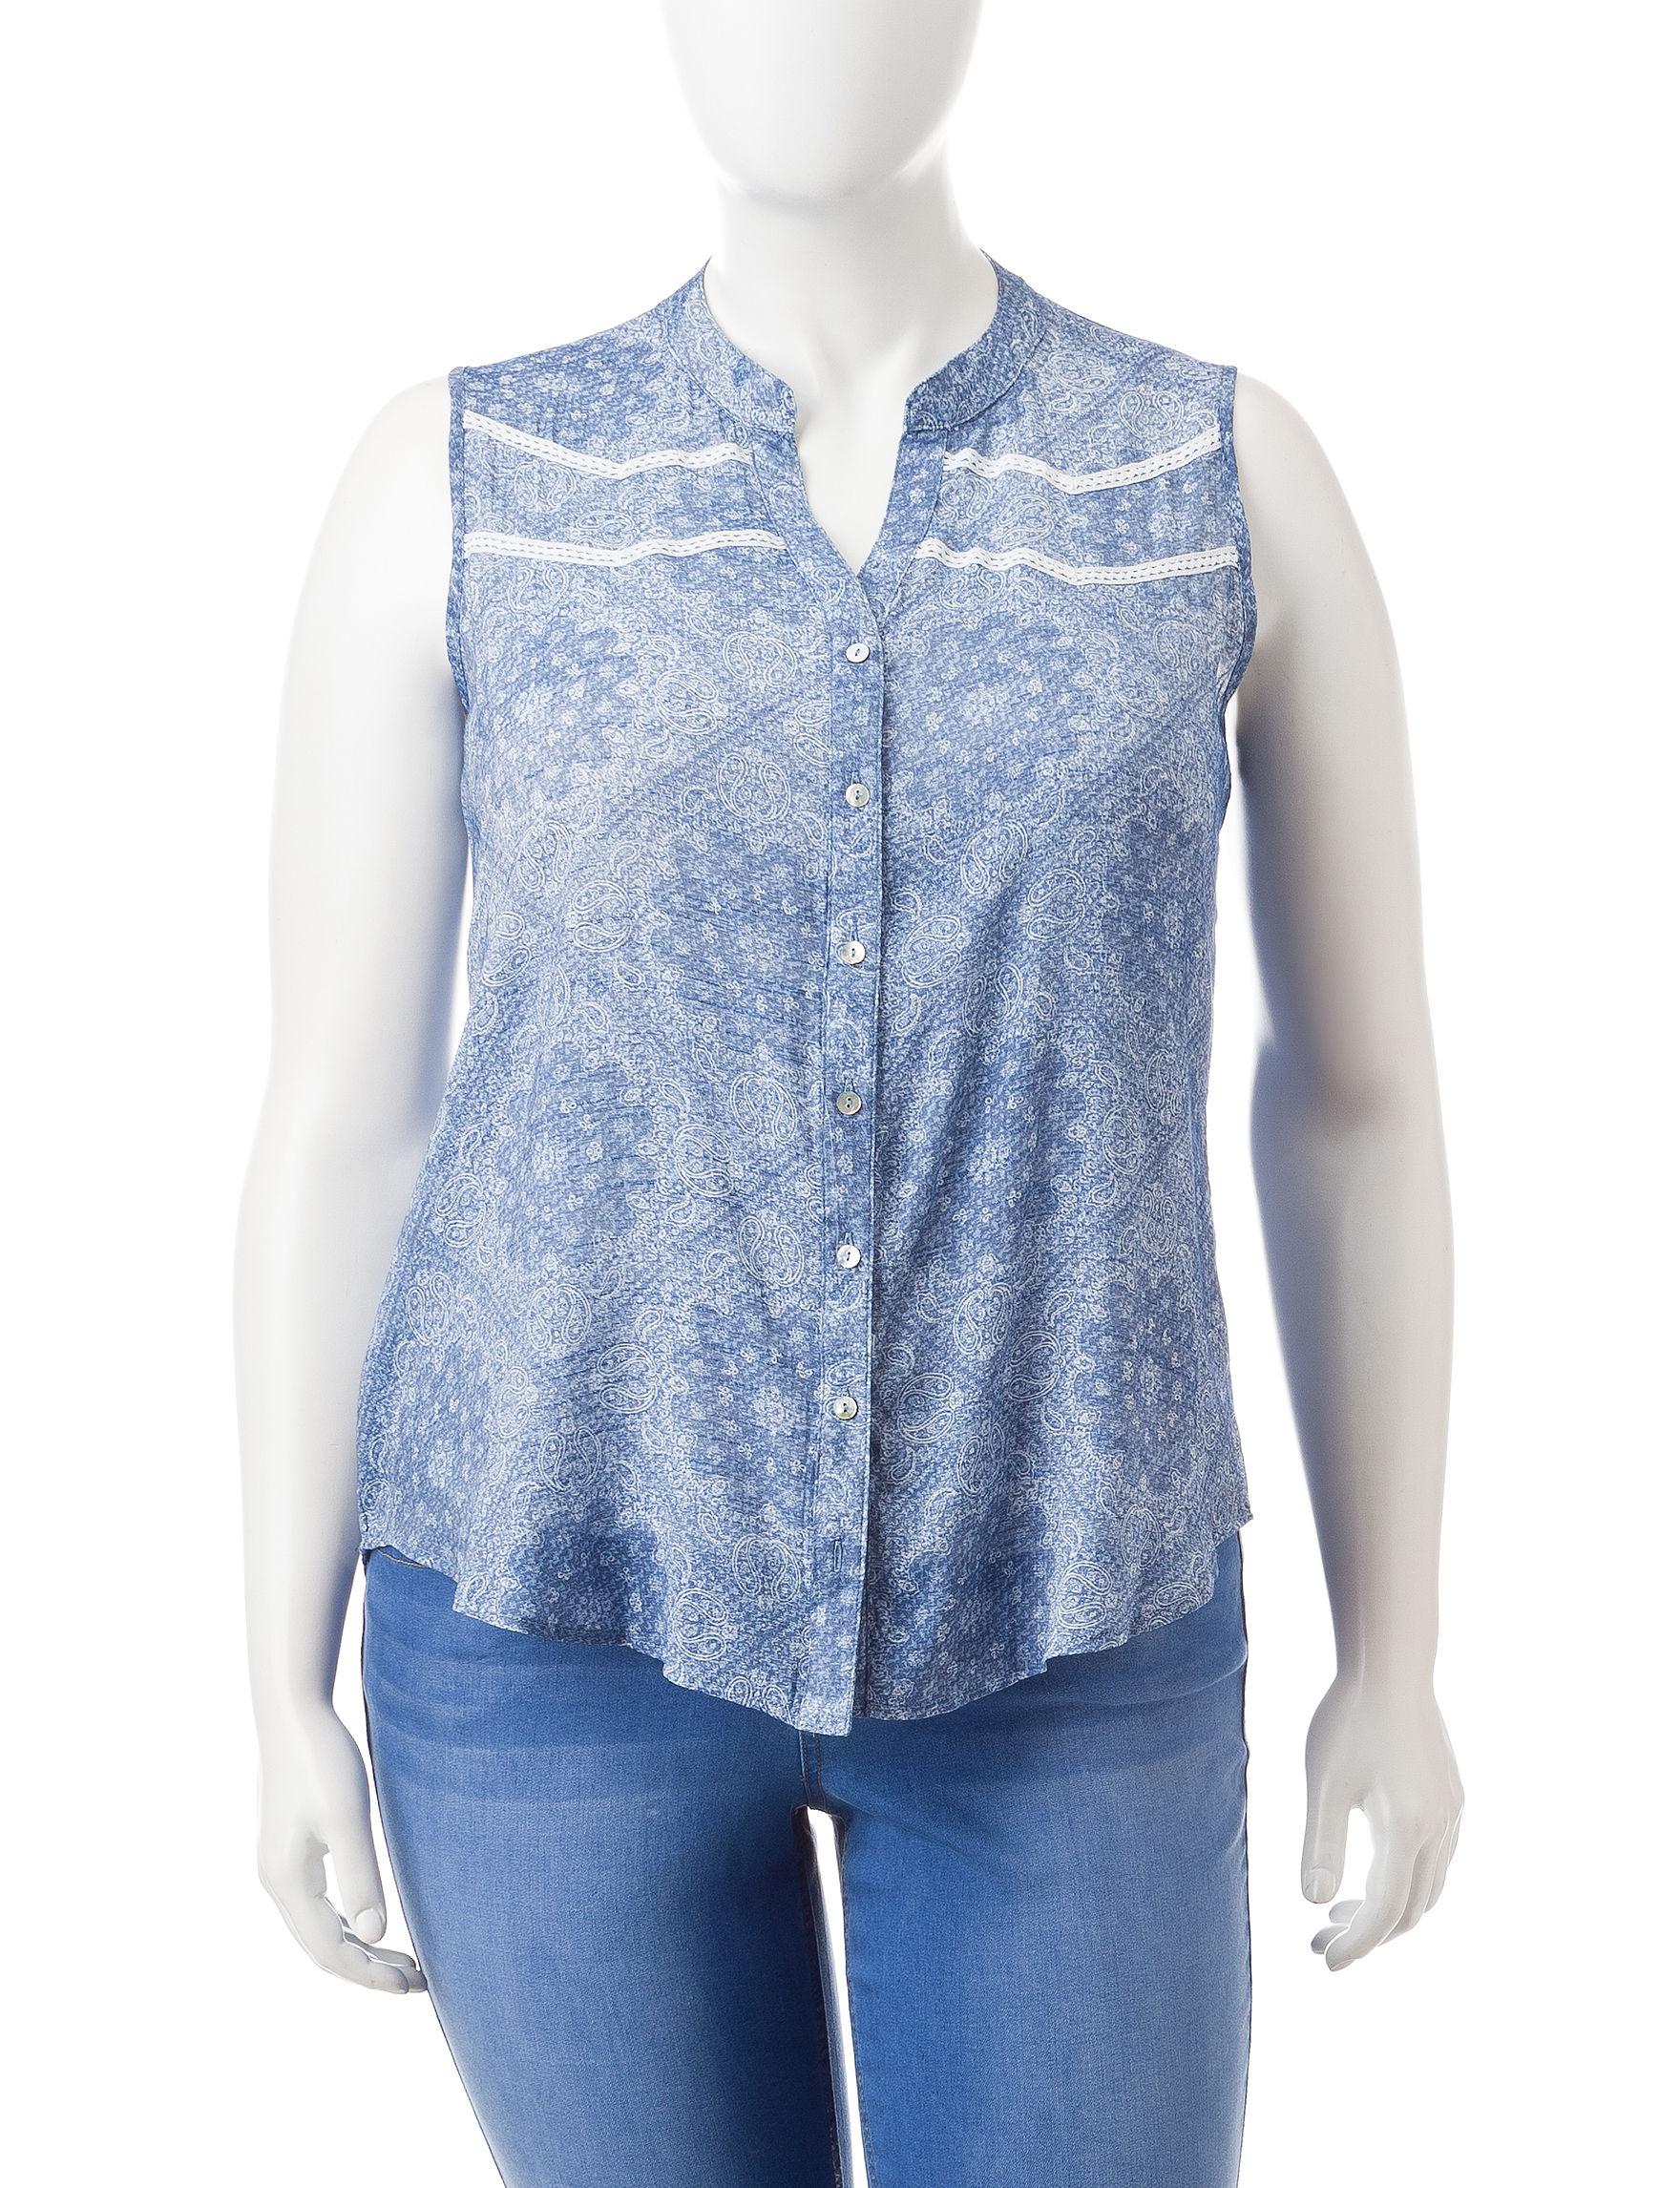 Self Esteem Blue / White Shirts & Blouses